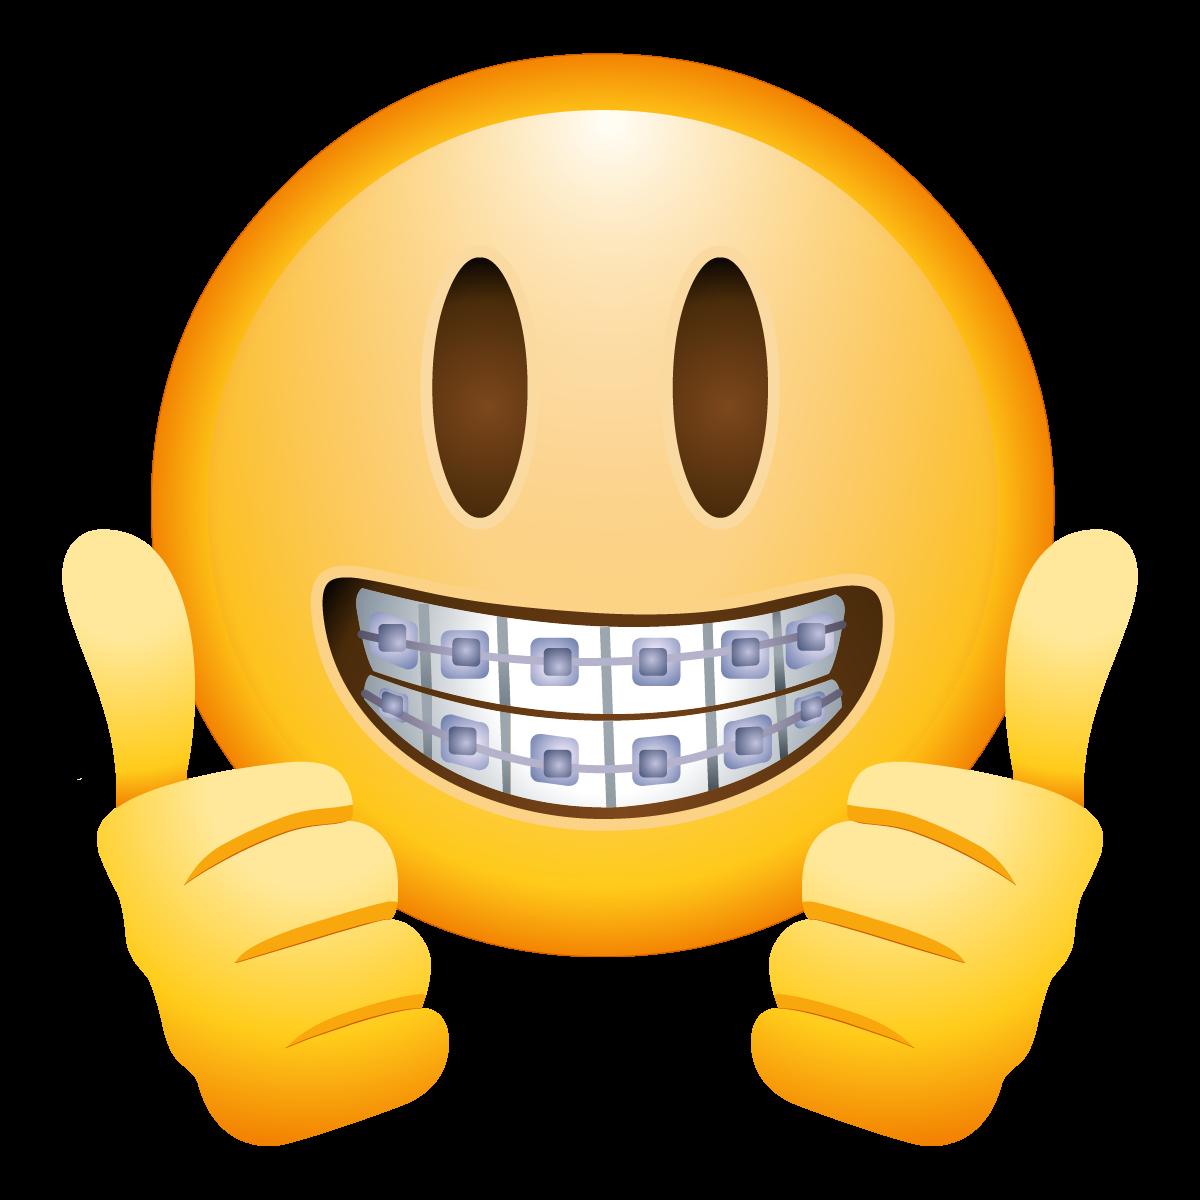 whip clipart emoji